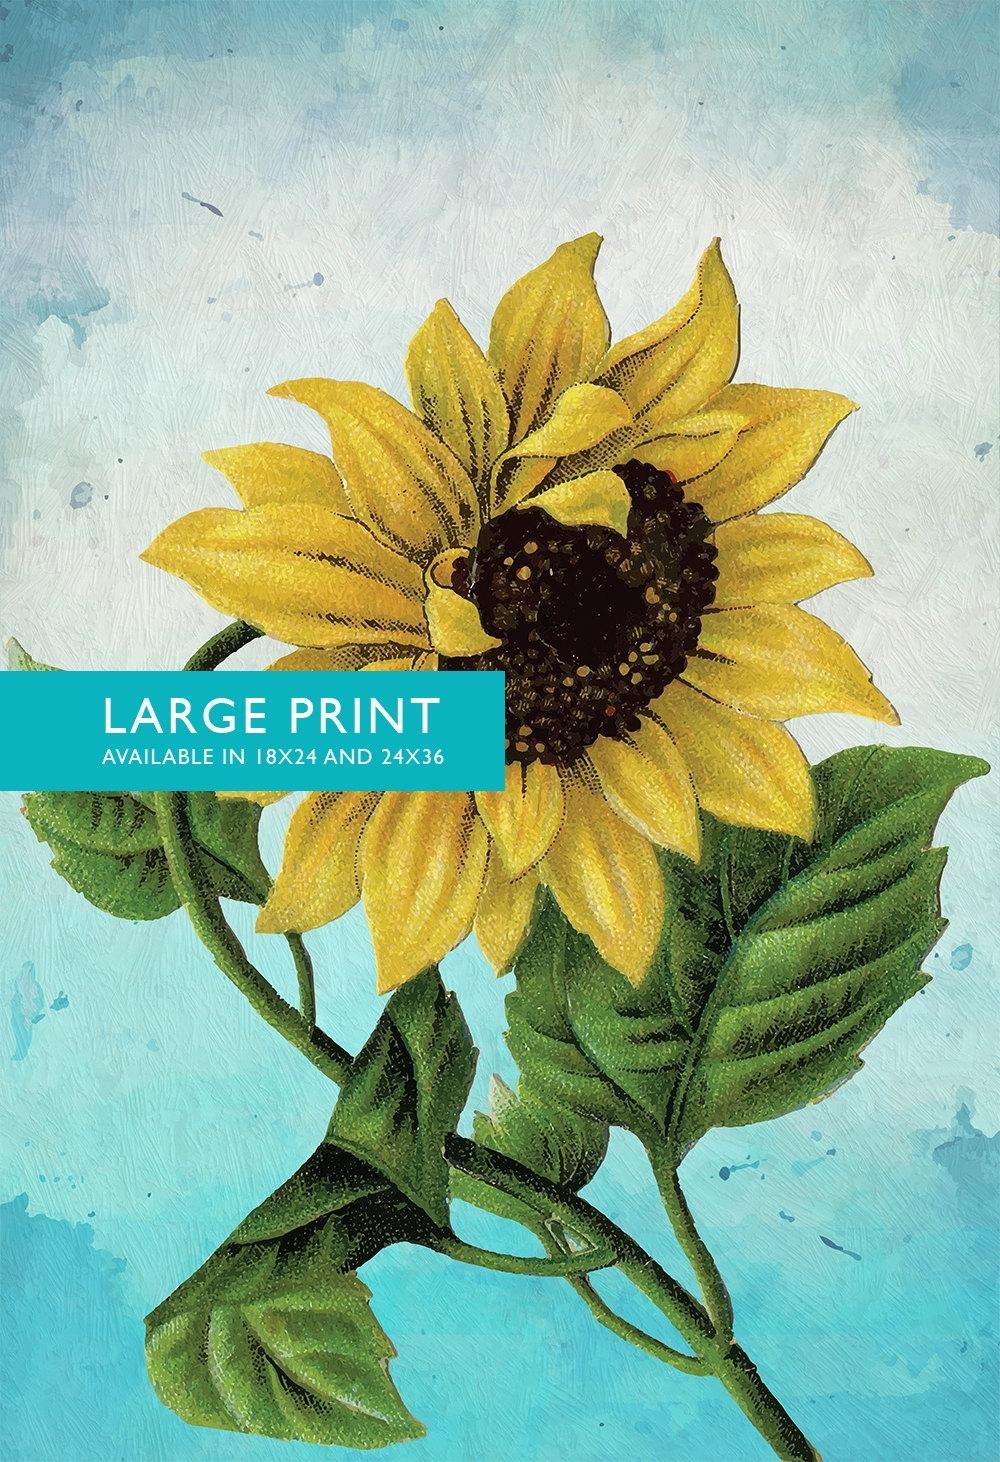 Sunflower Print Set Of Two Sunflowers Art Botanical Print Flower Intended For 2017 Sunflower Wall Art (View 13 of 20)